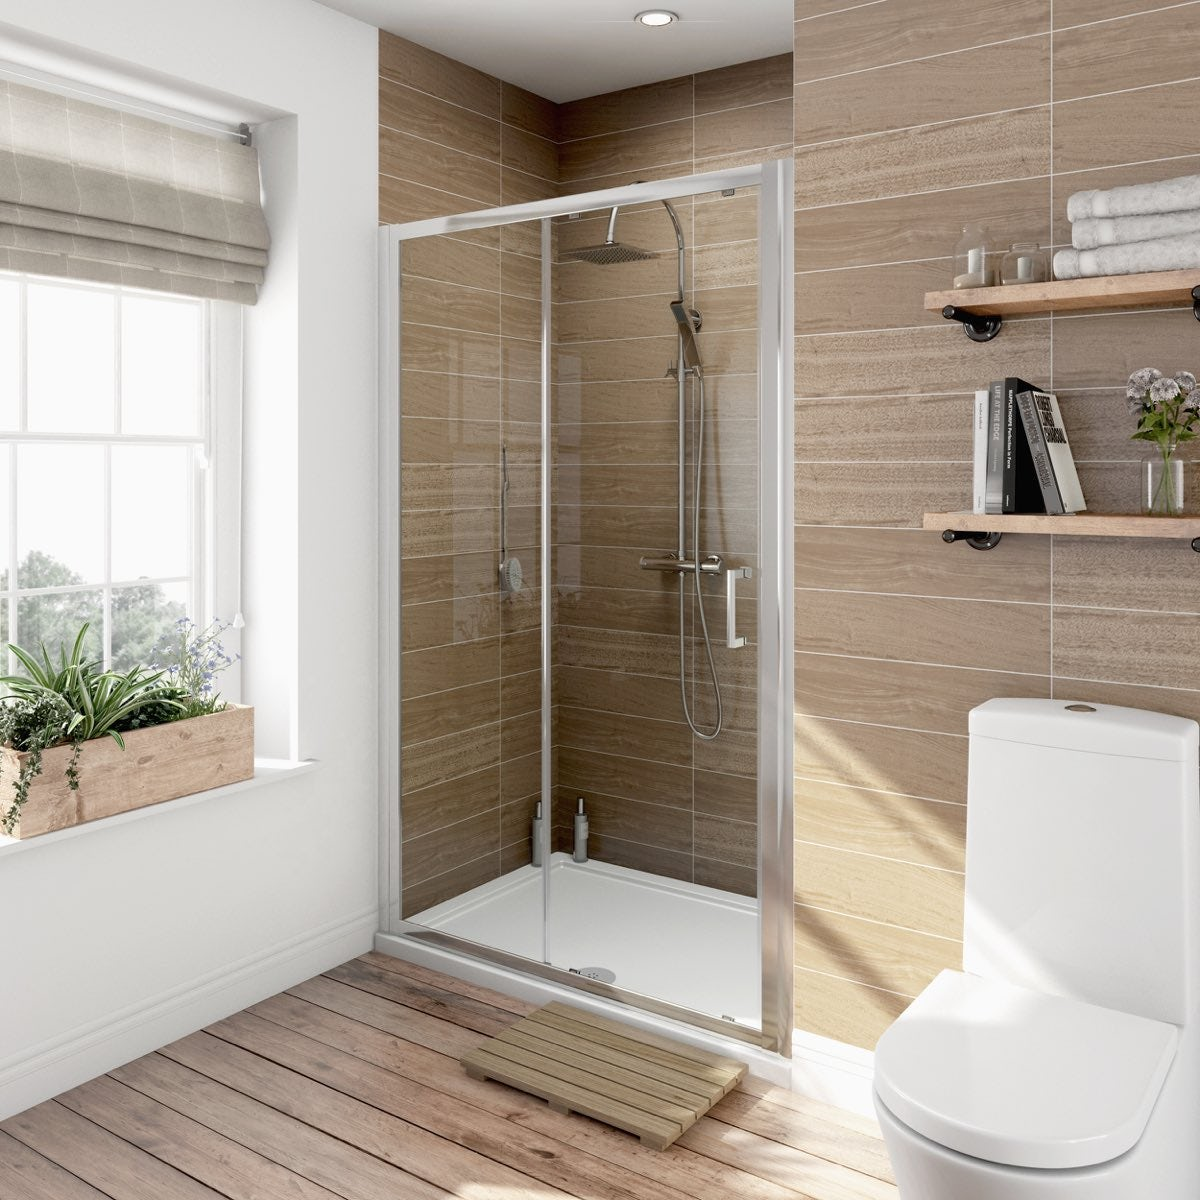 Orchard 6mm sliding shower door 1000mm